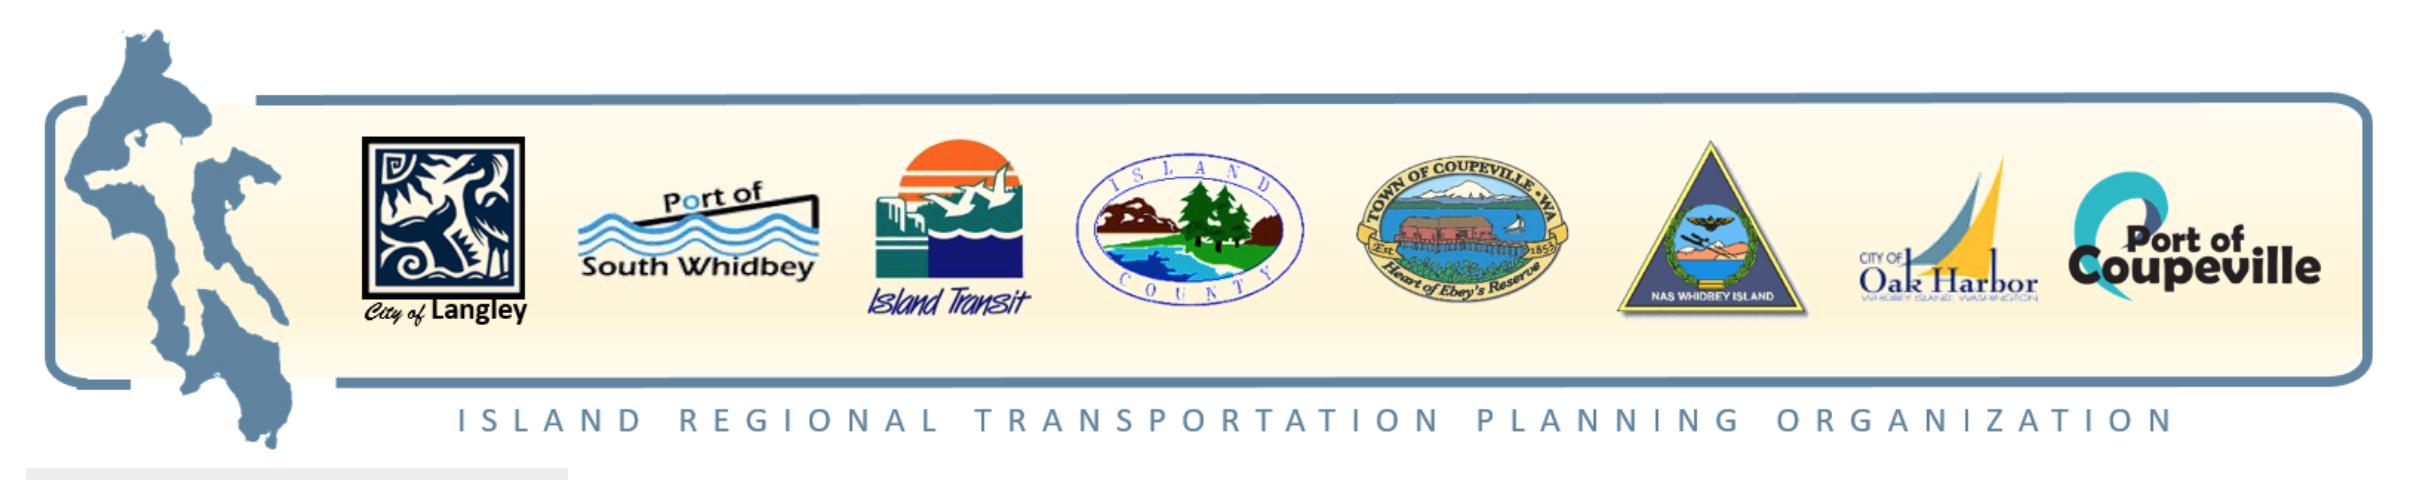 Island Regional Transportation Planning Organization